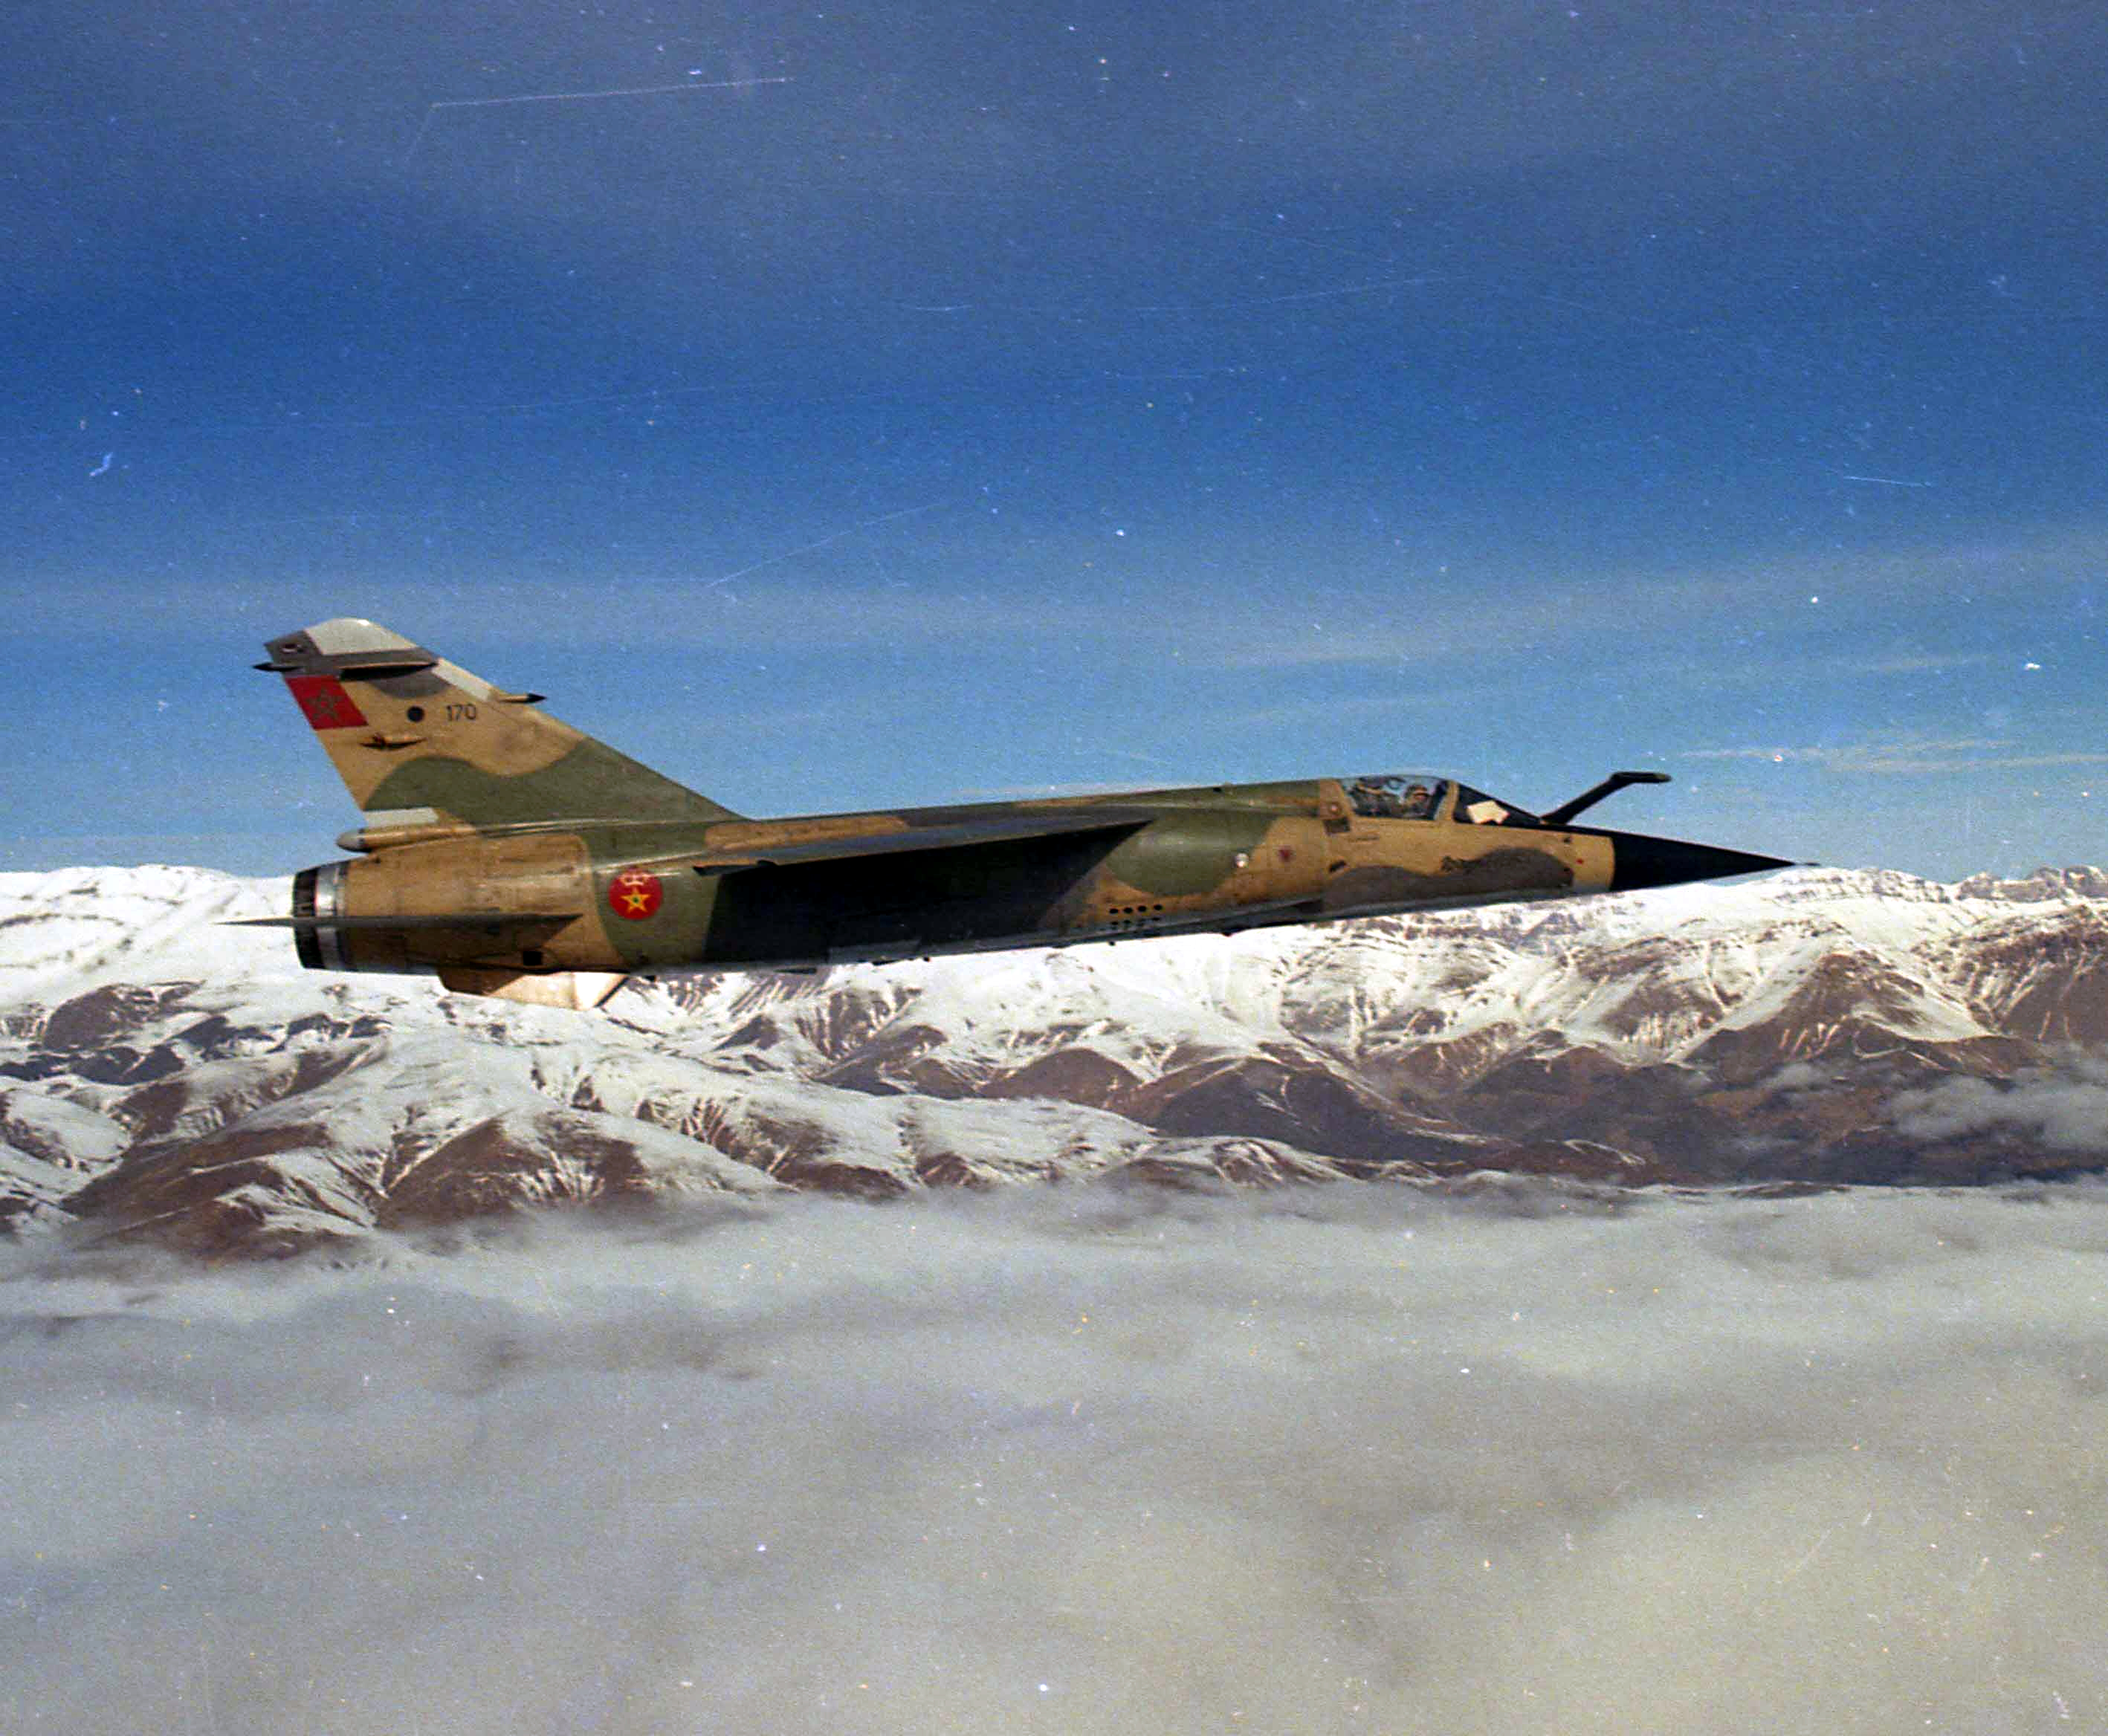 FRA: Photos Mirage F1 - Page 15 45319668685_35a7b47dac_o